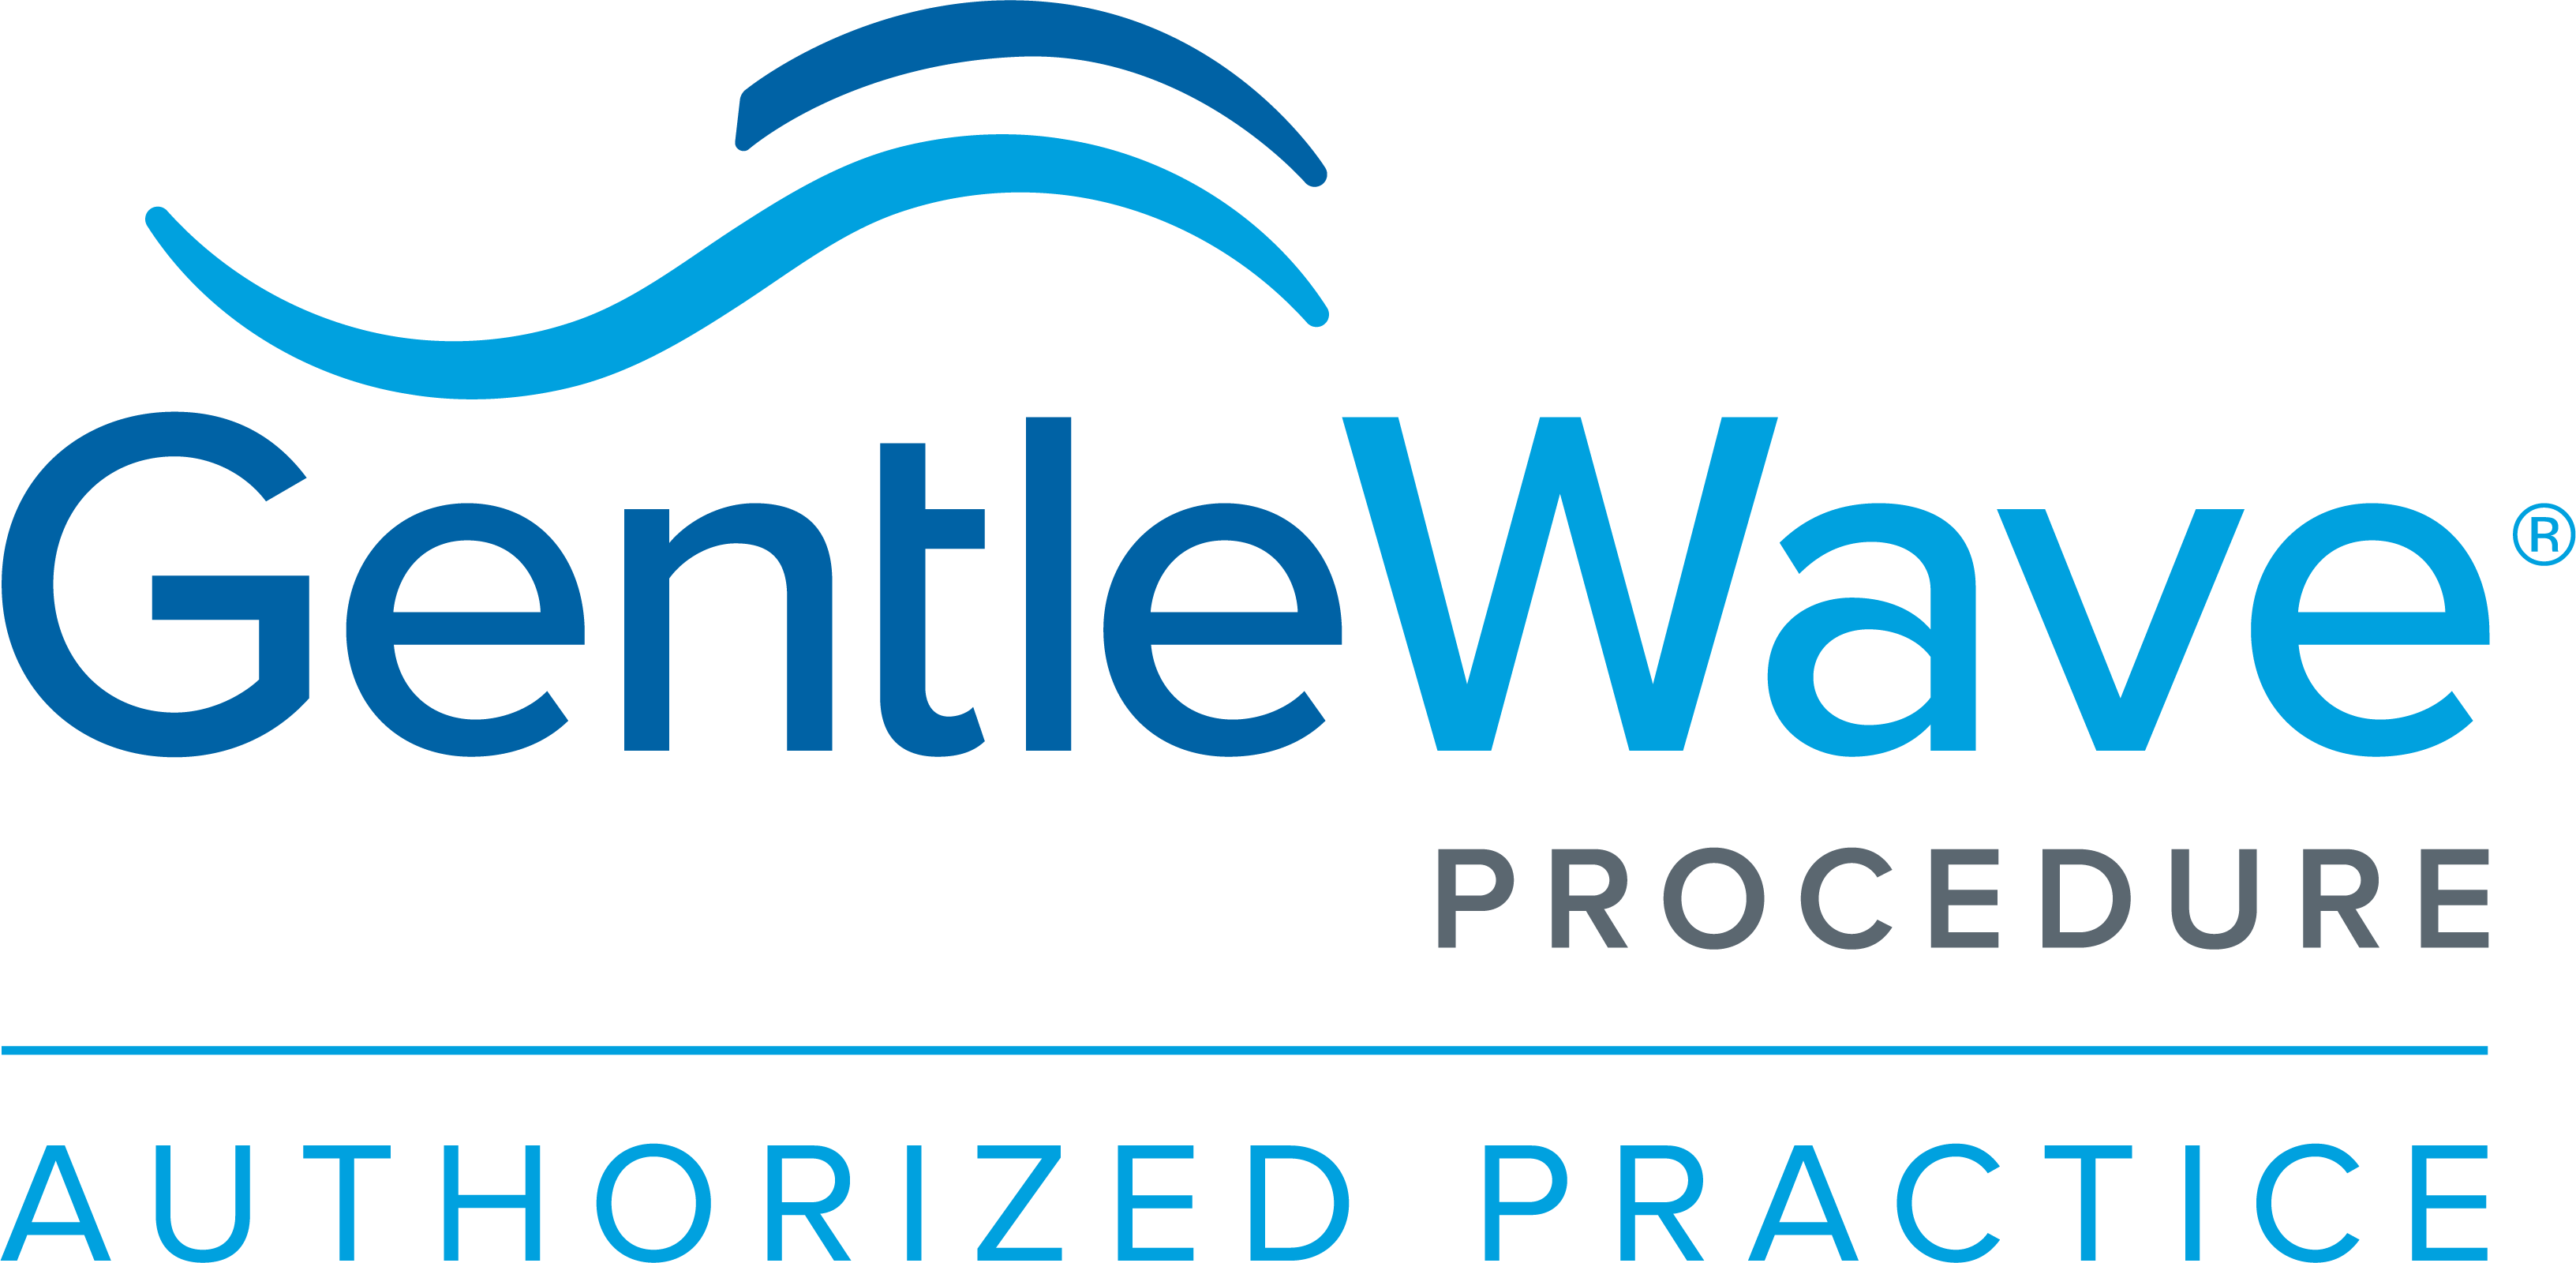 gentlewave_authorized_practice_logo